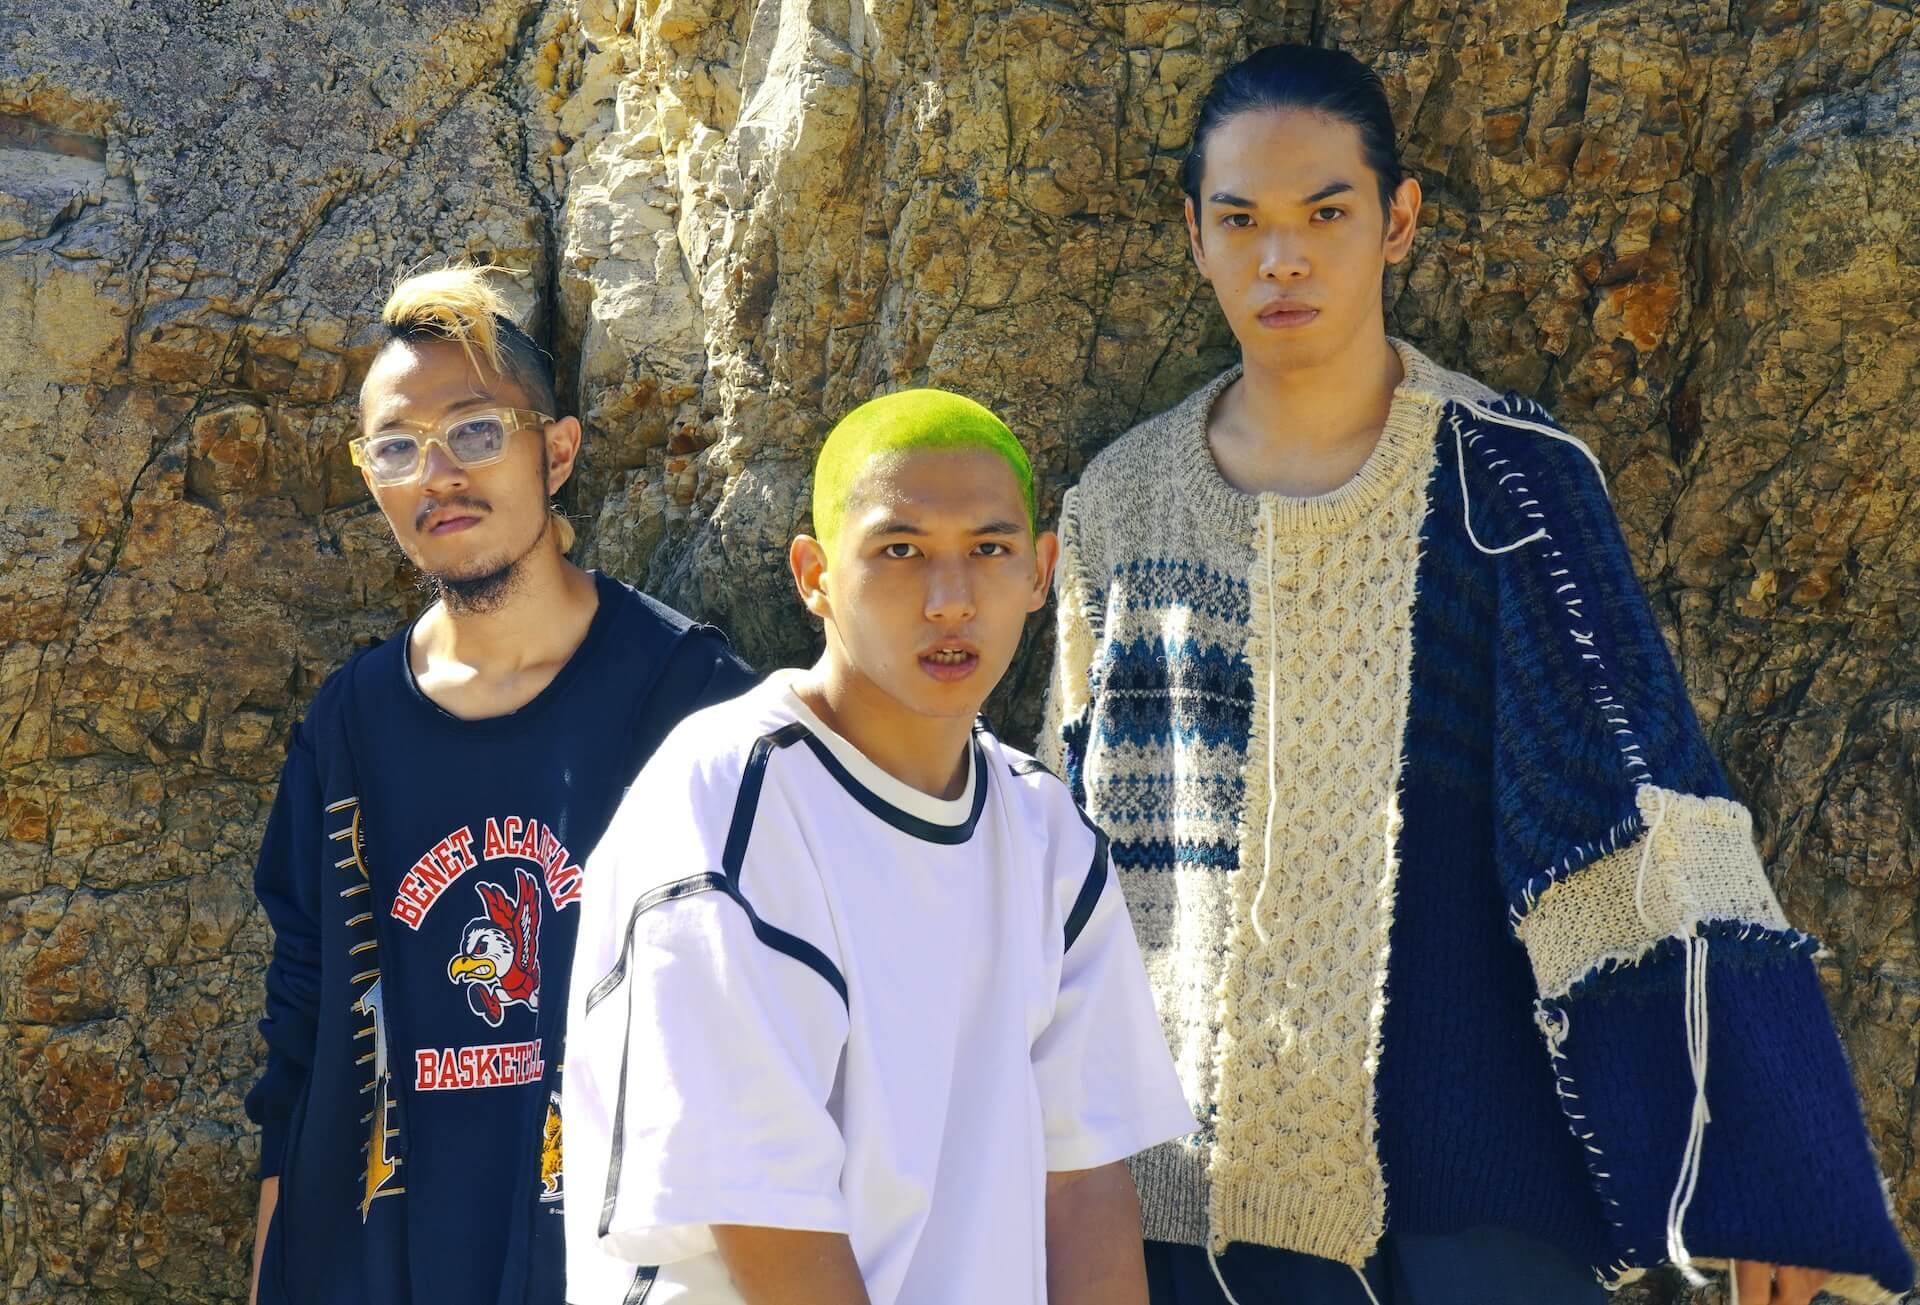 Dos Monosが2ndアルバム『DosSiki』のリメイクアルバムを発表!崎山蒼志、black midi、SMTKらが参加 music_210720_Dos-monos1